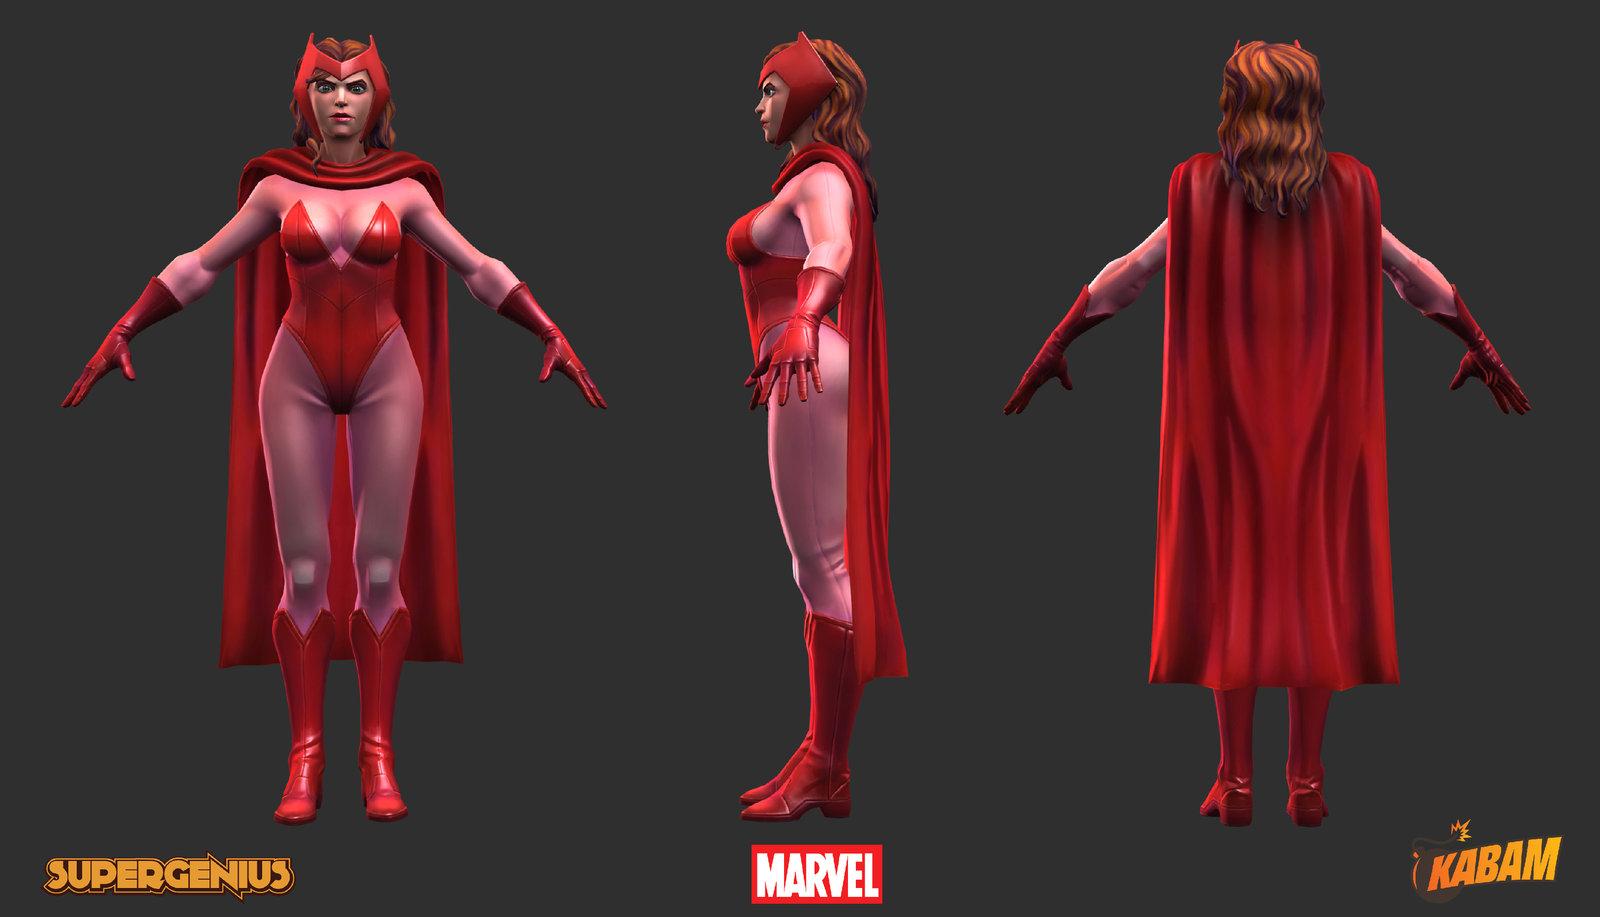 Marvel: Scarlet Witch